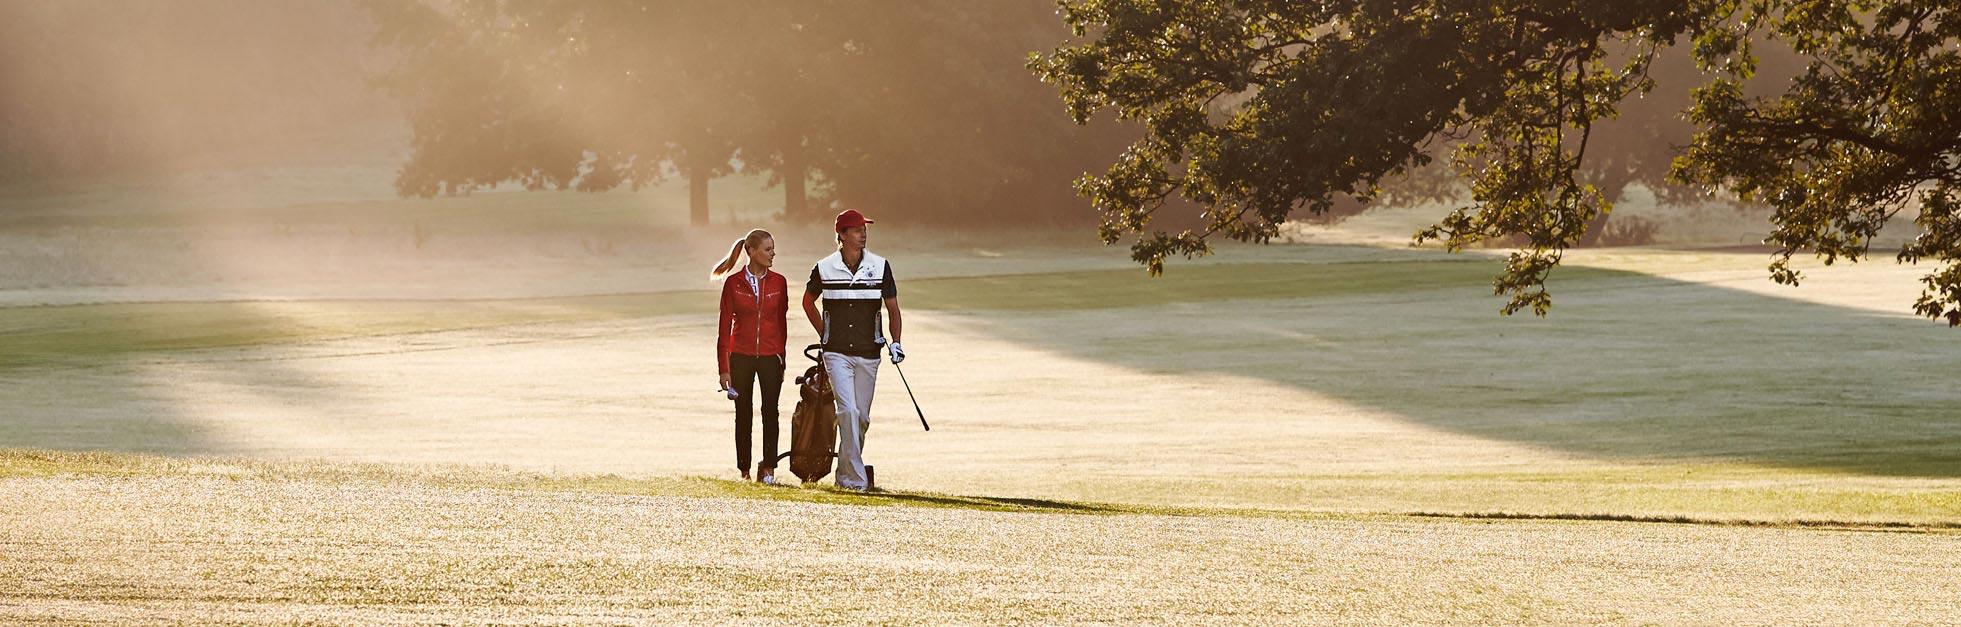 one eagle golf